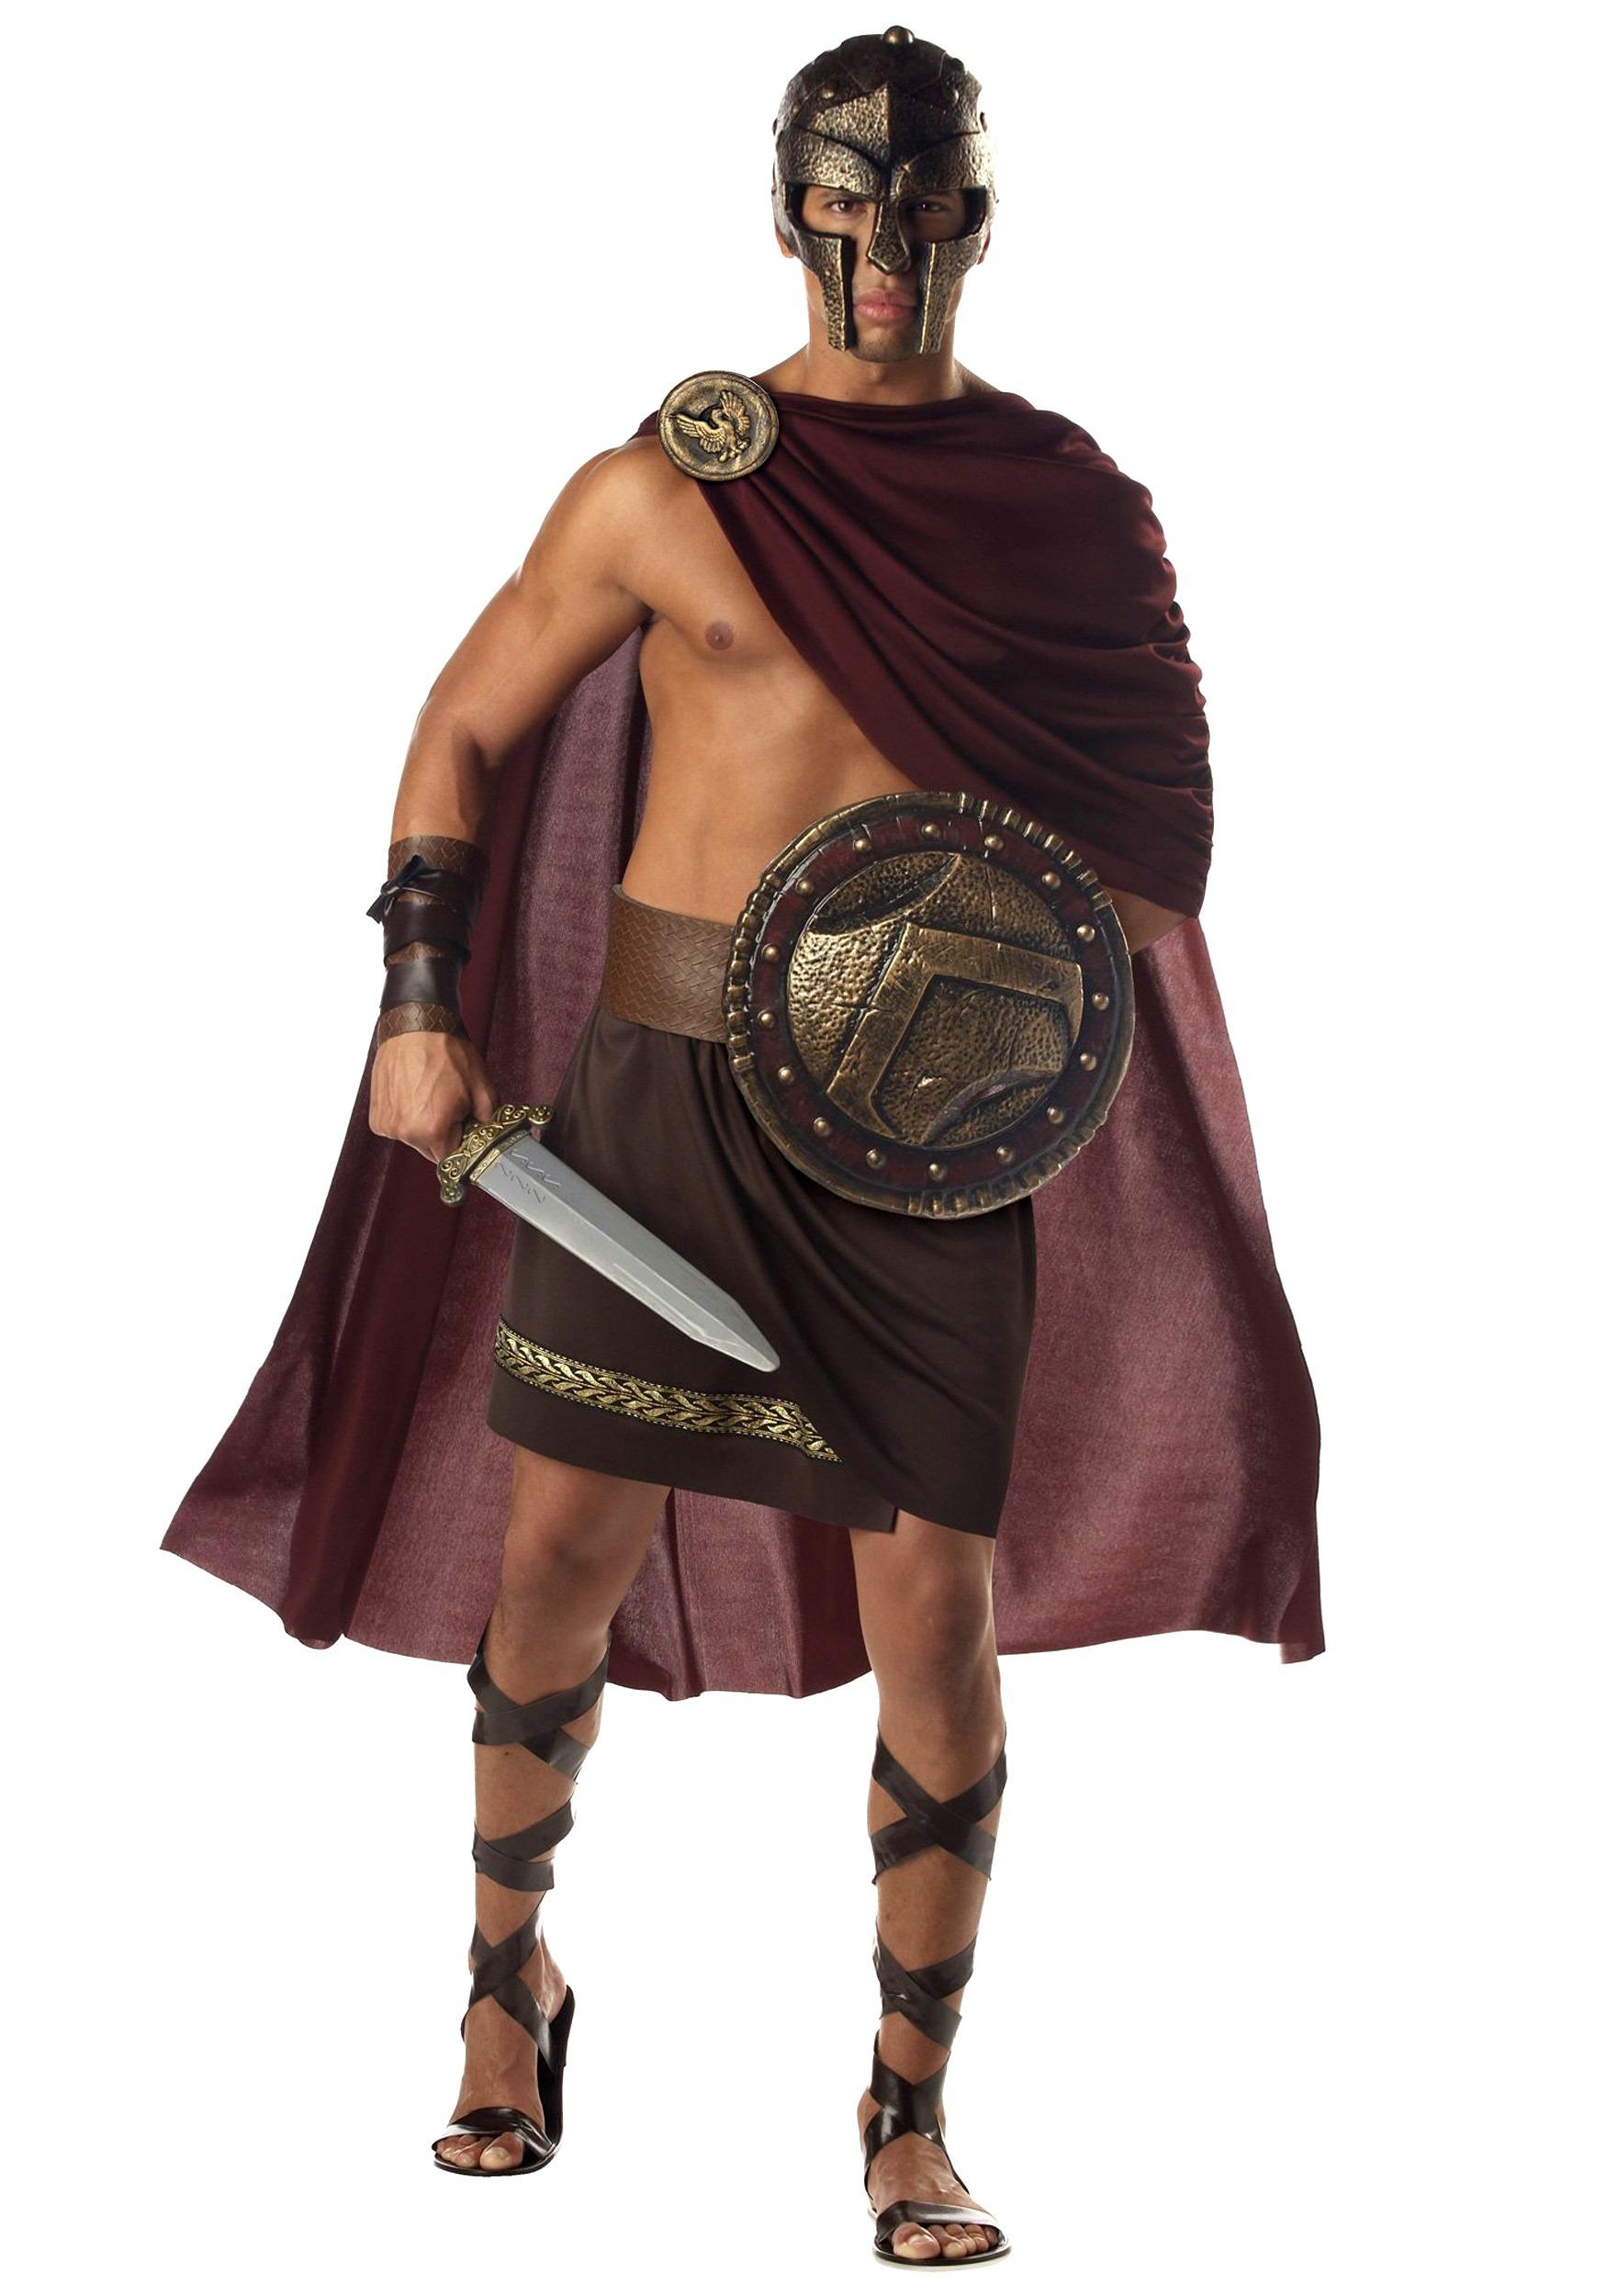 Spartan Halloween Costume  sc 1 st  Halloween Costume & Spartan Warrior Costumes - Halloween 300 Spartan Costumes